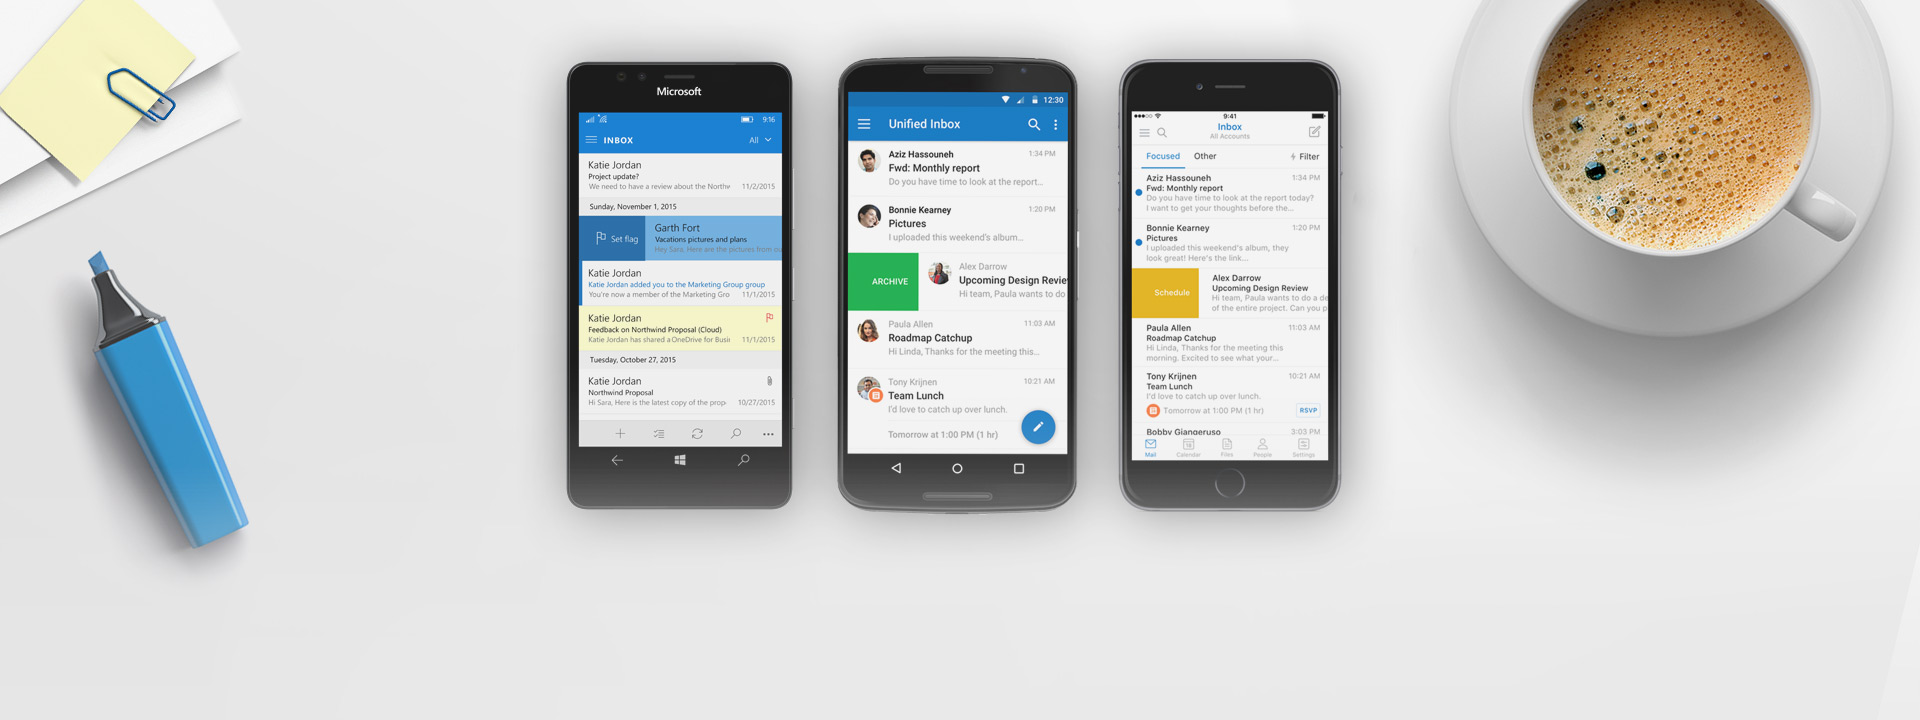 屏幕上显示 Outlook 应用的 Windows Phone、iPhone 和 Android 手机